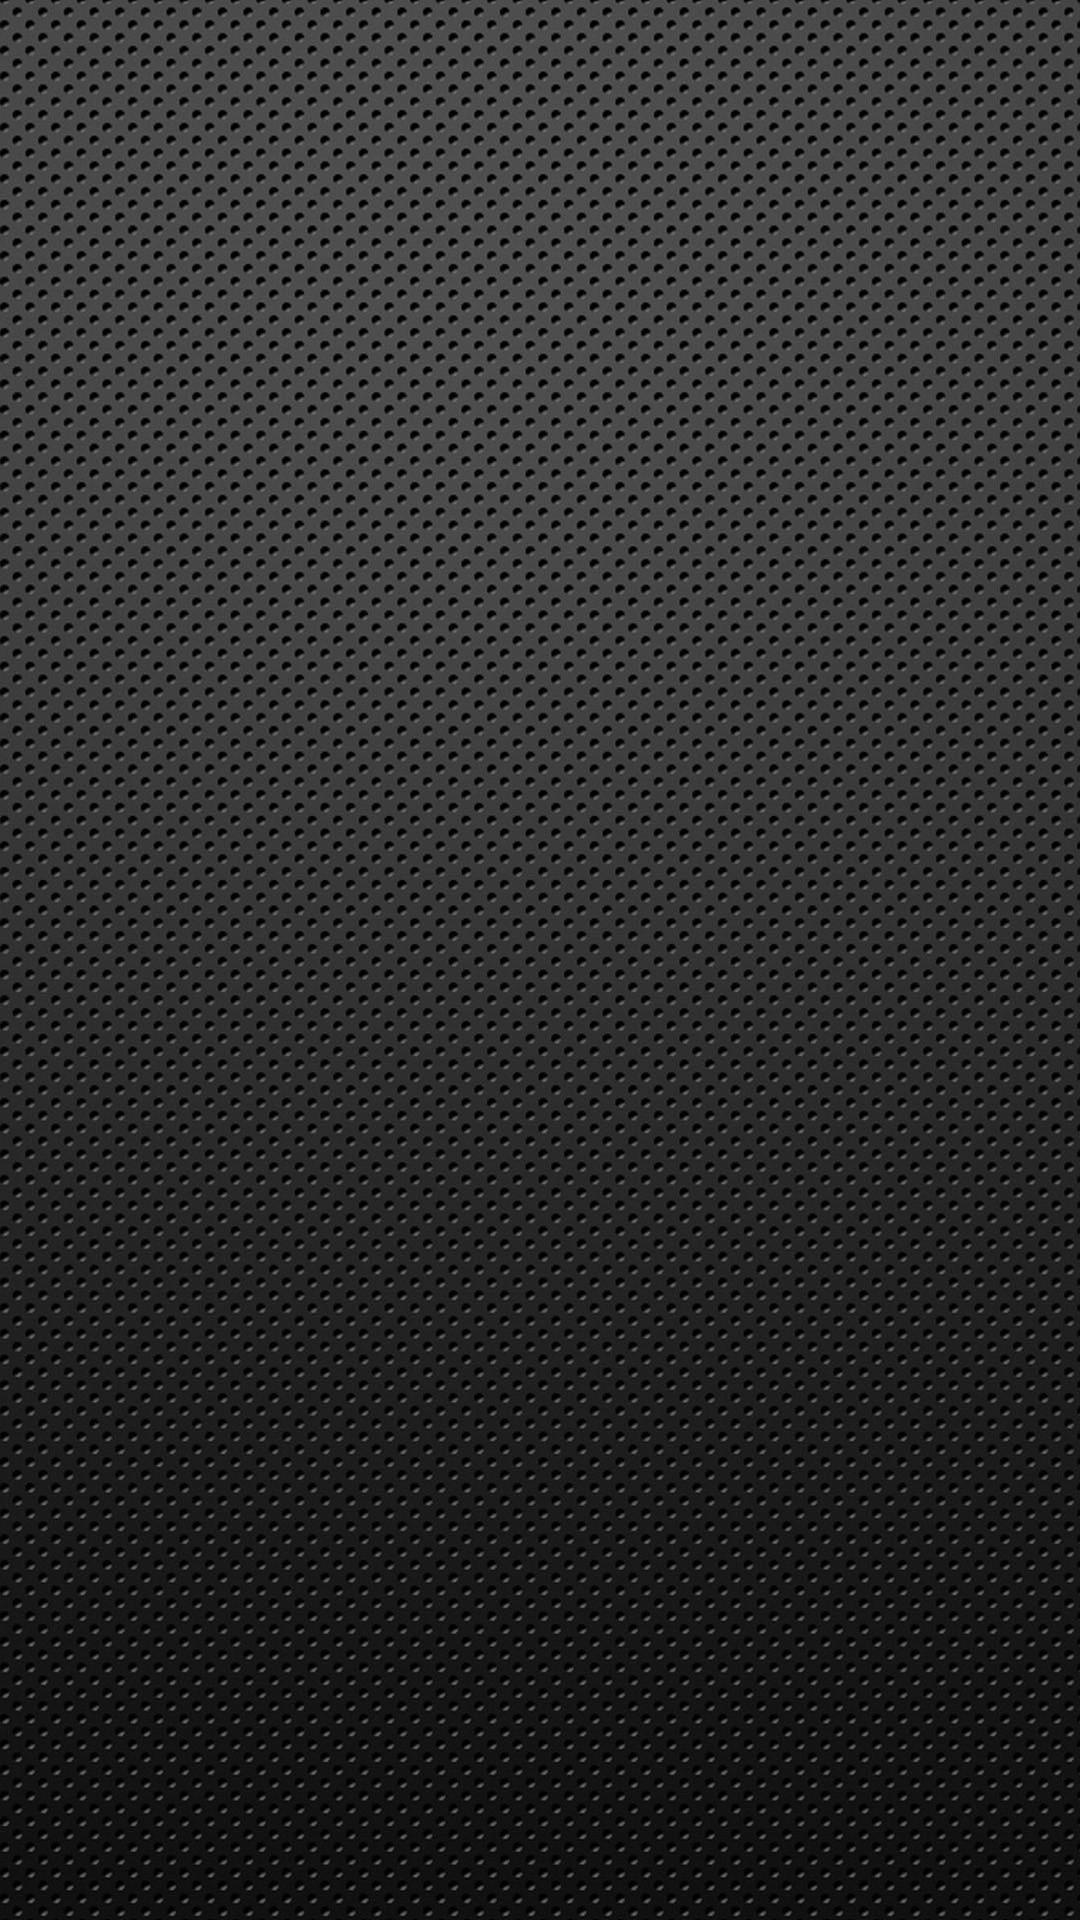 Carbon Fiber Gryffin By Betahouse HD desktop wallpaper